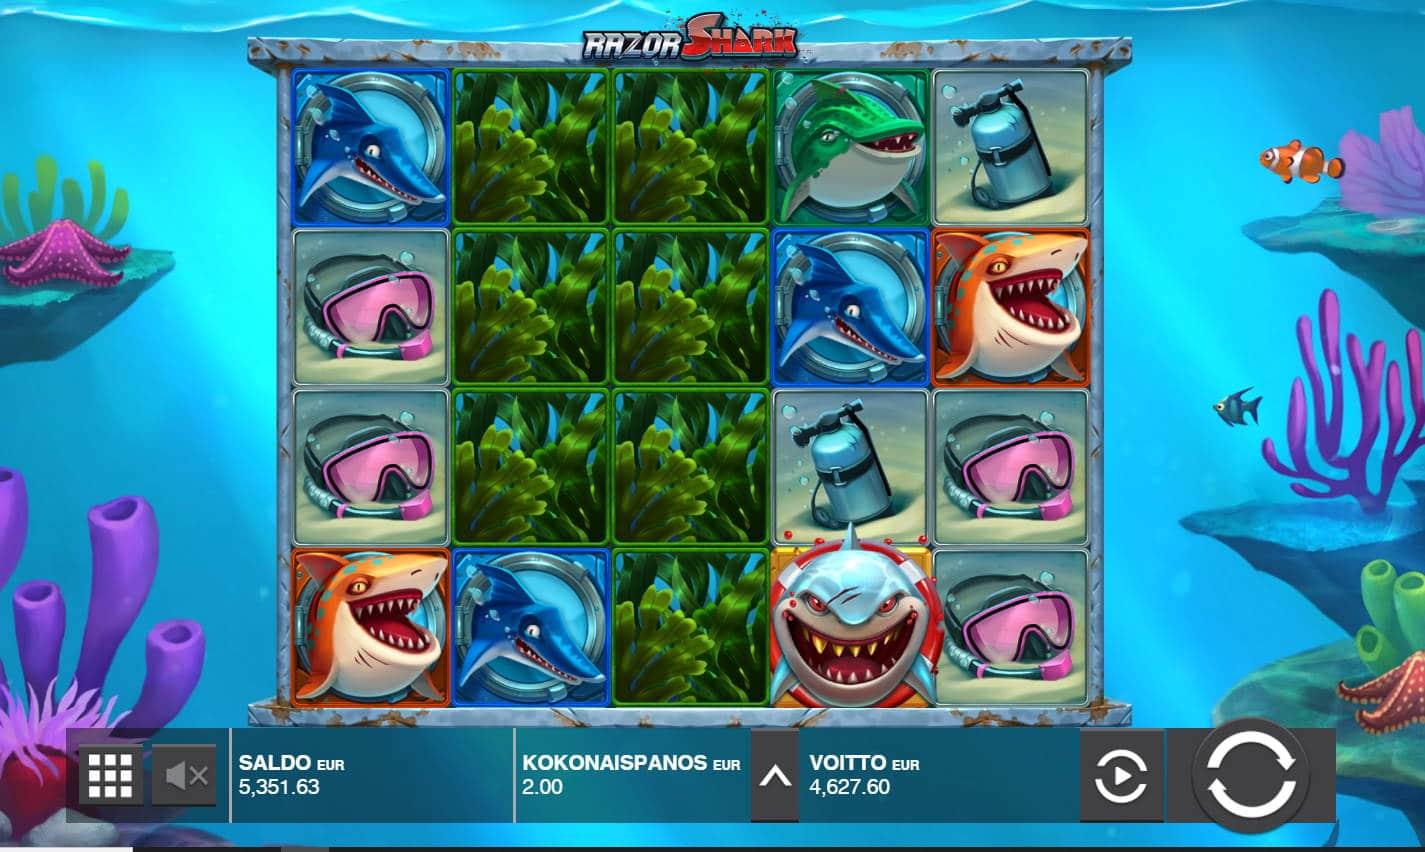 Razor Shark Casino win picture by Morrimoykky 30.12.2020 4627.60e 2314X